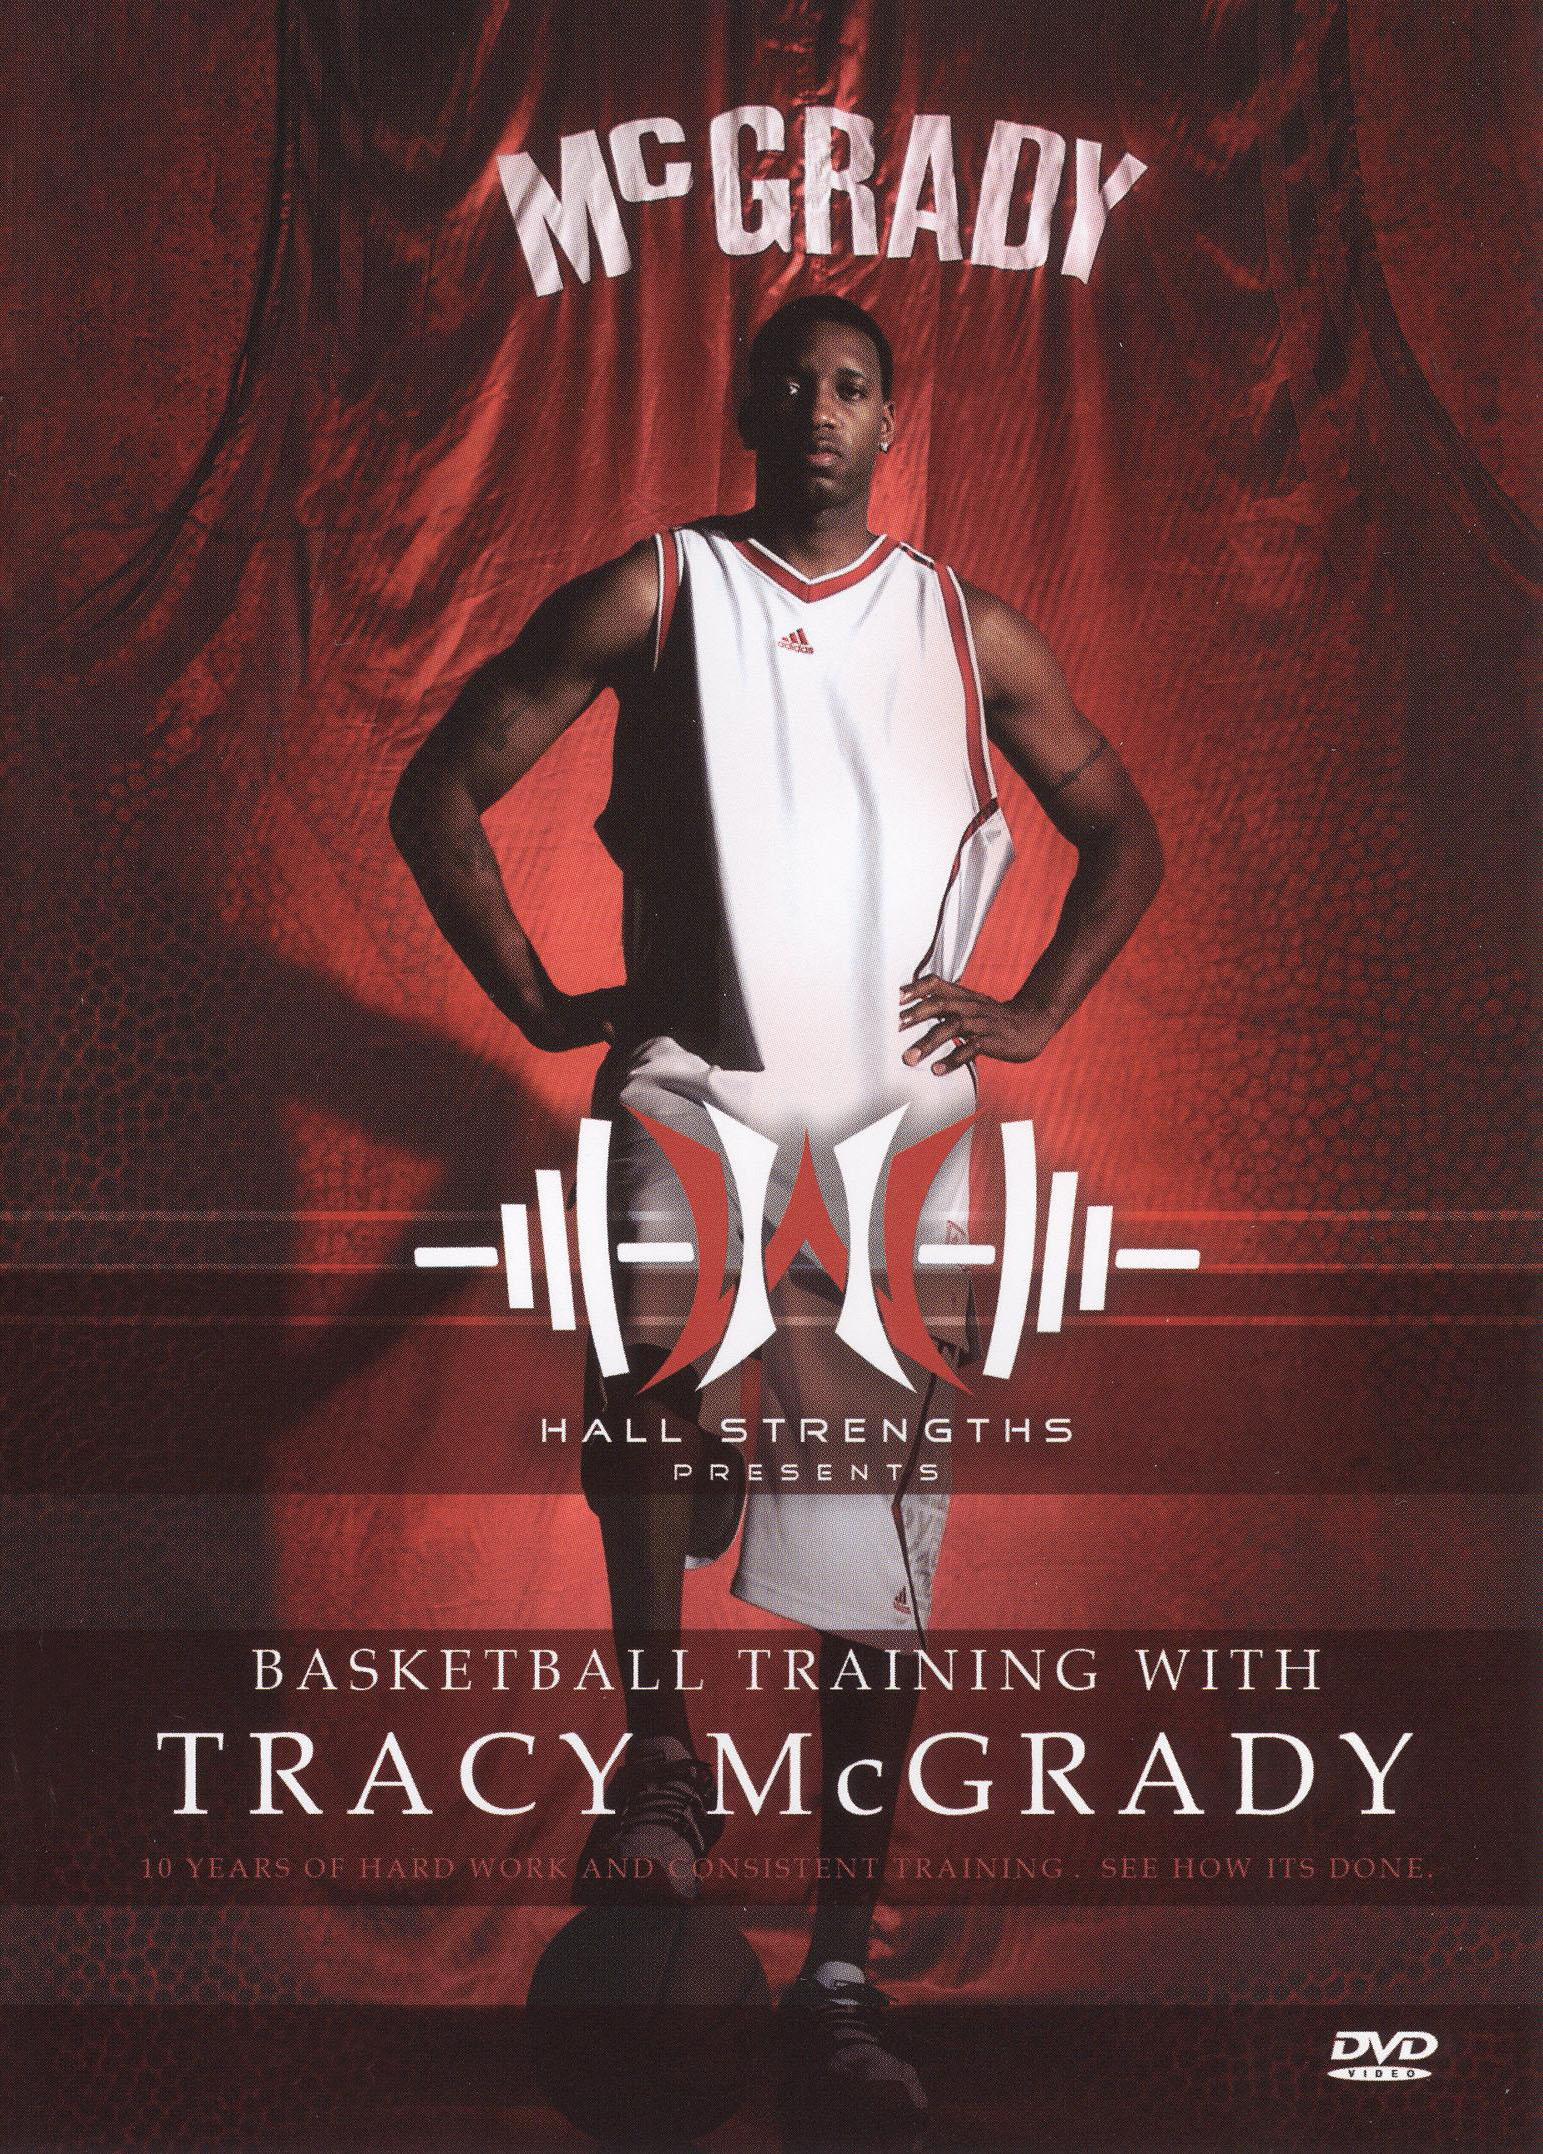 Basketball Training with Tracy McGrady